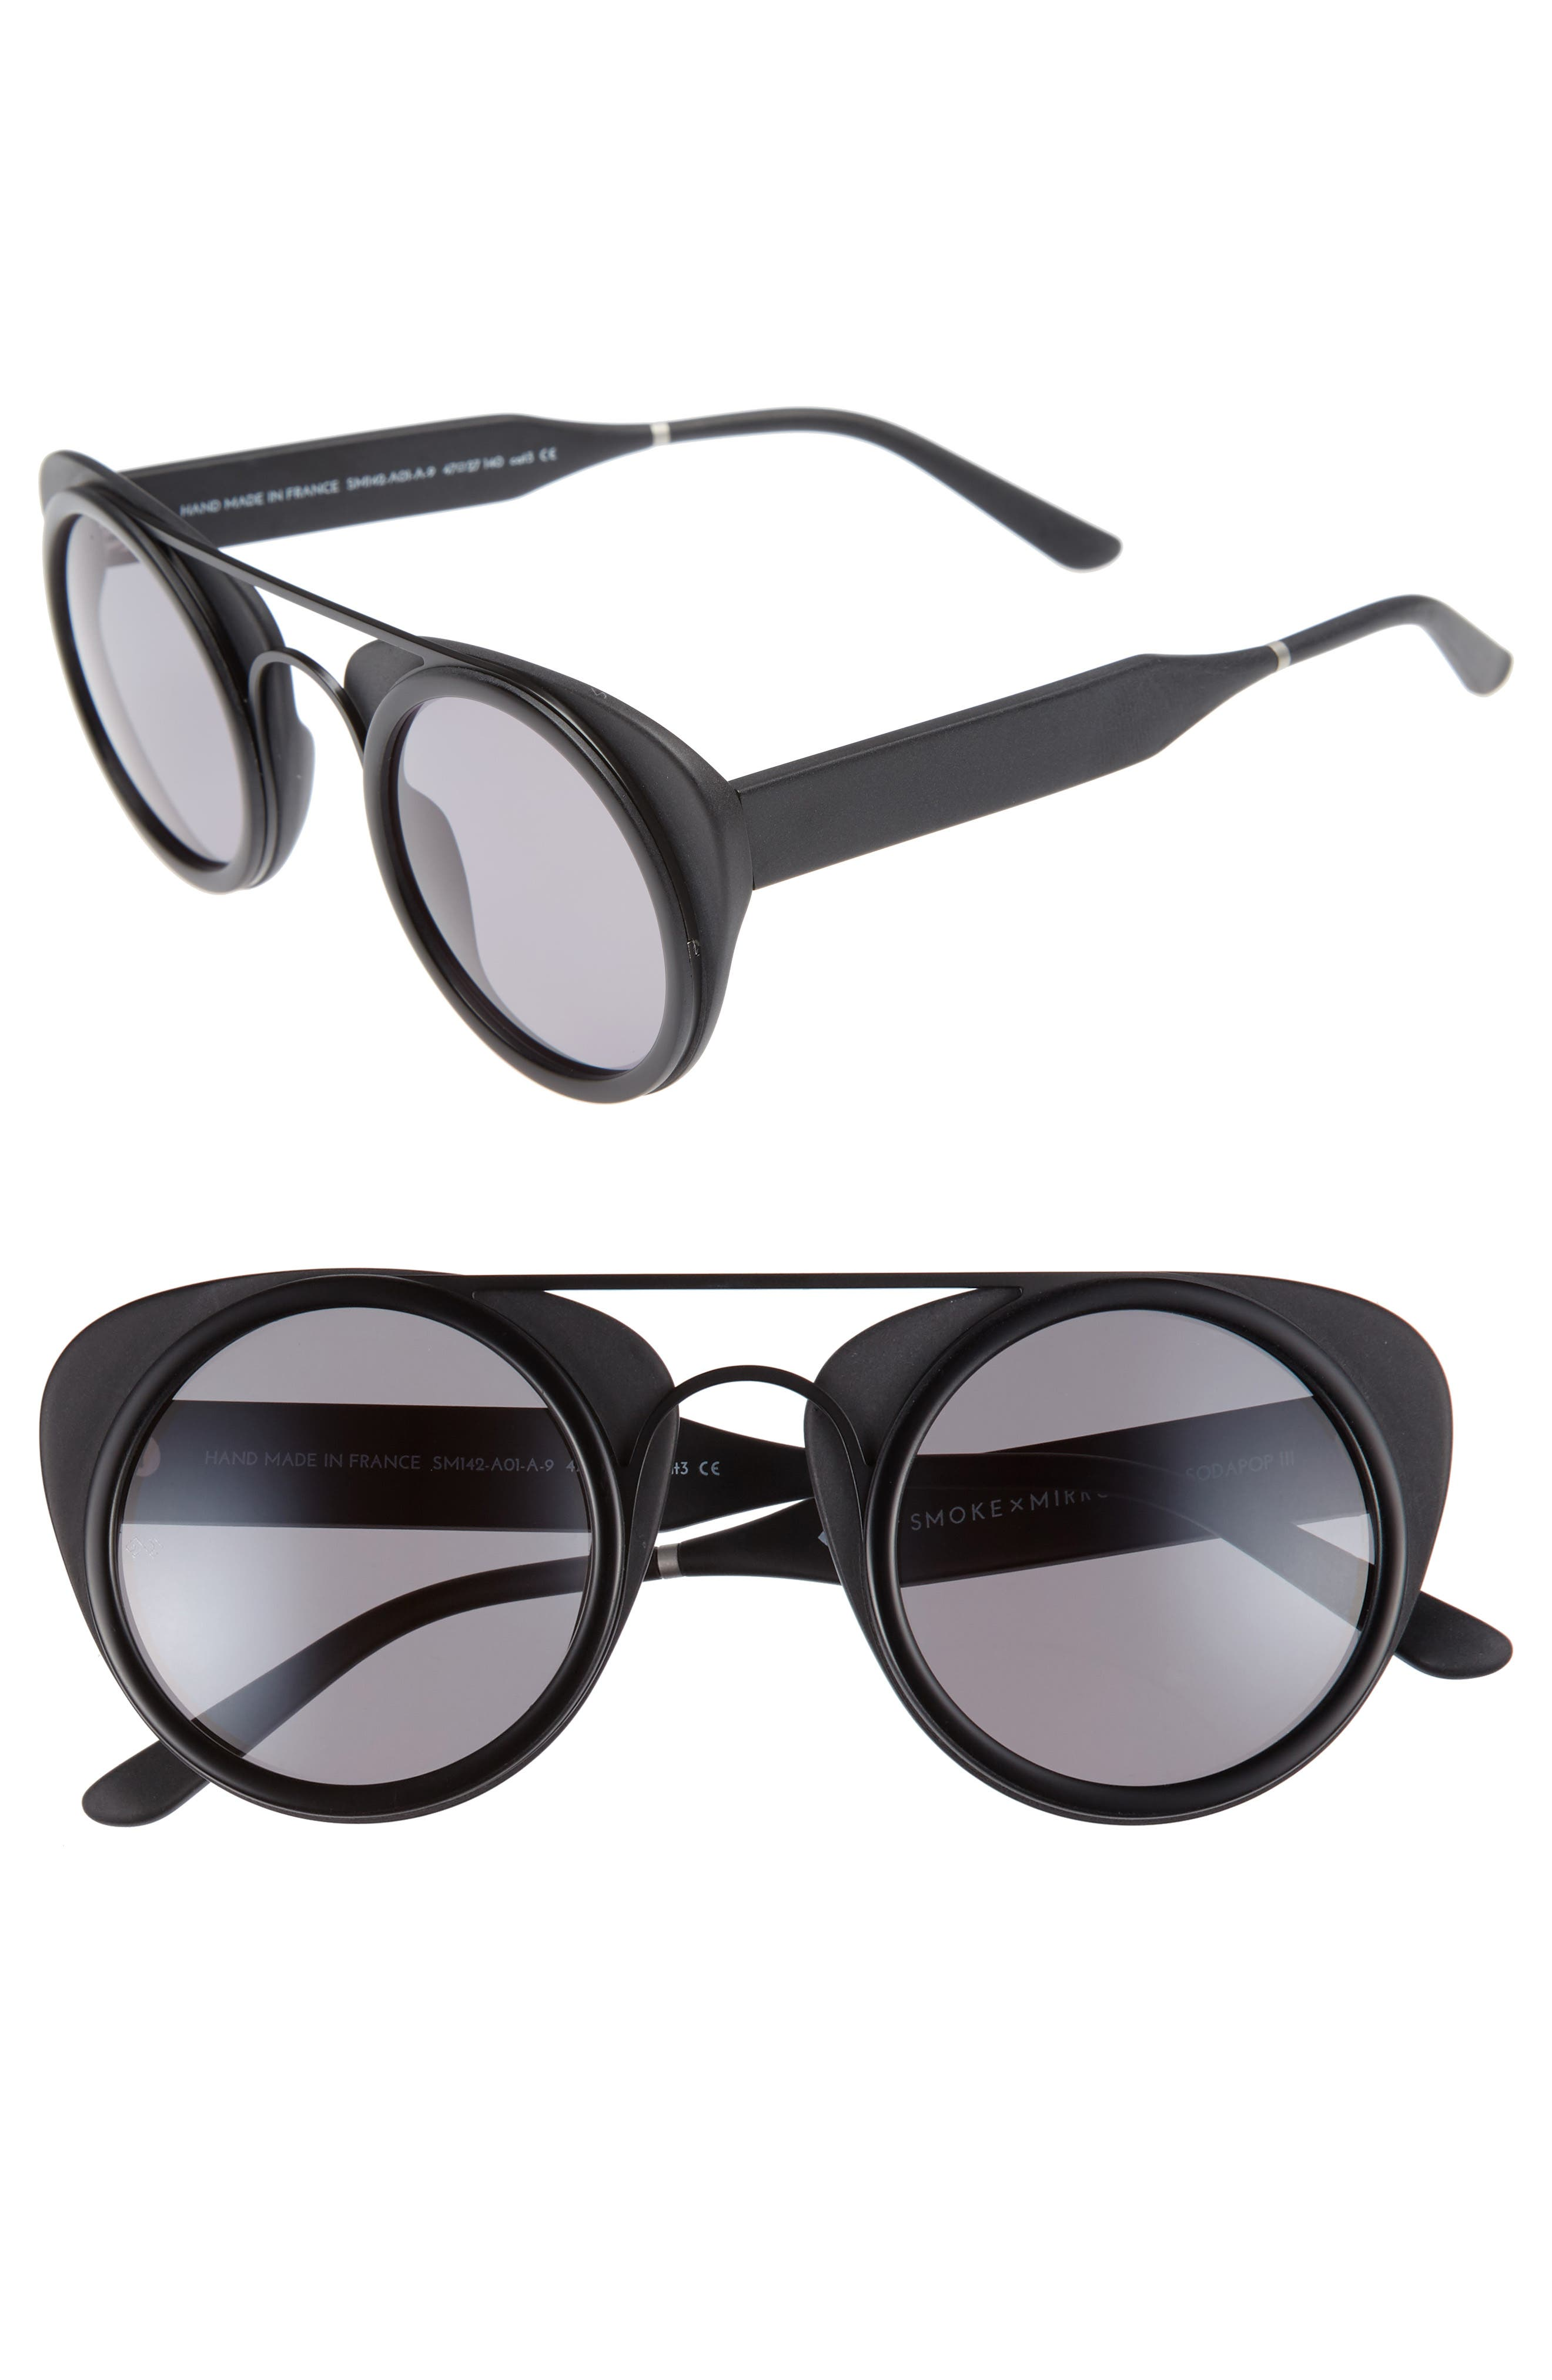 SMOKE X MIRRORS Soda Pop 3 47mm Retro Sunglasses